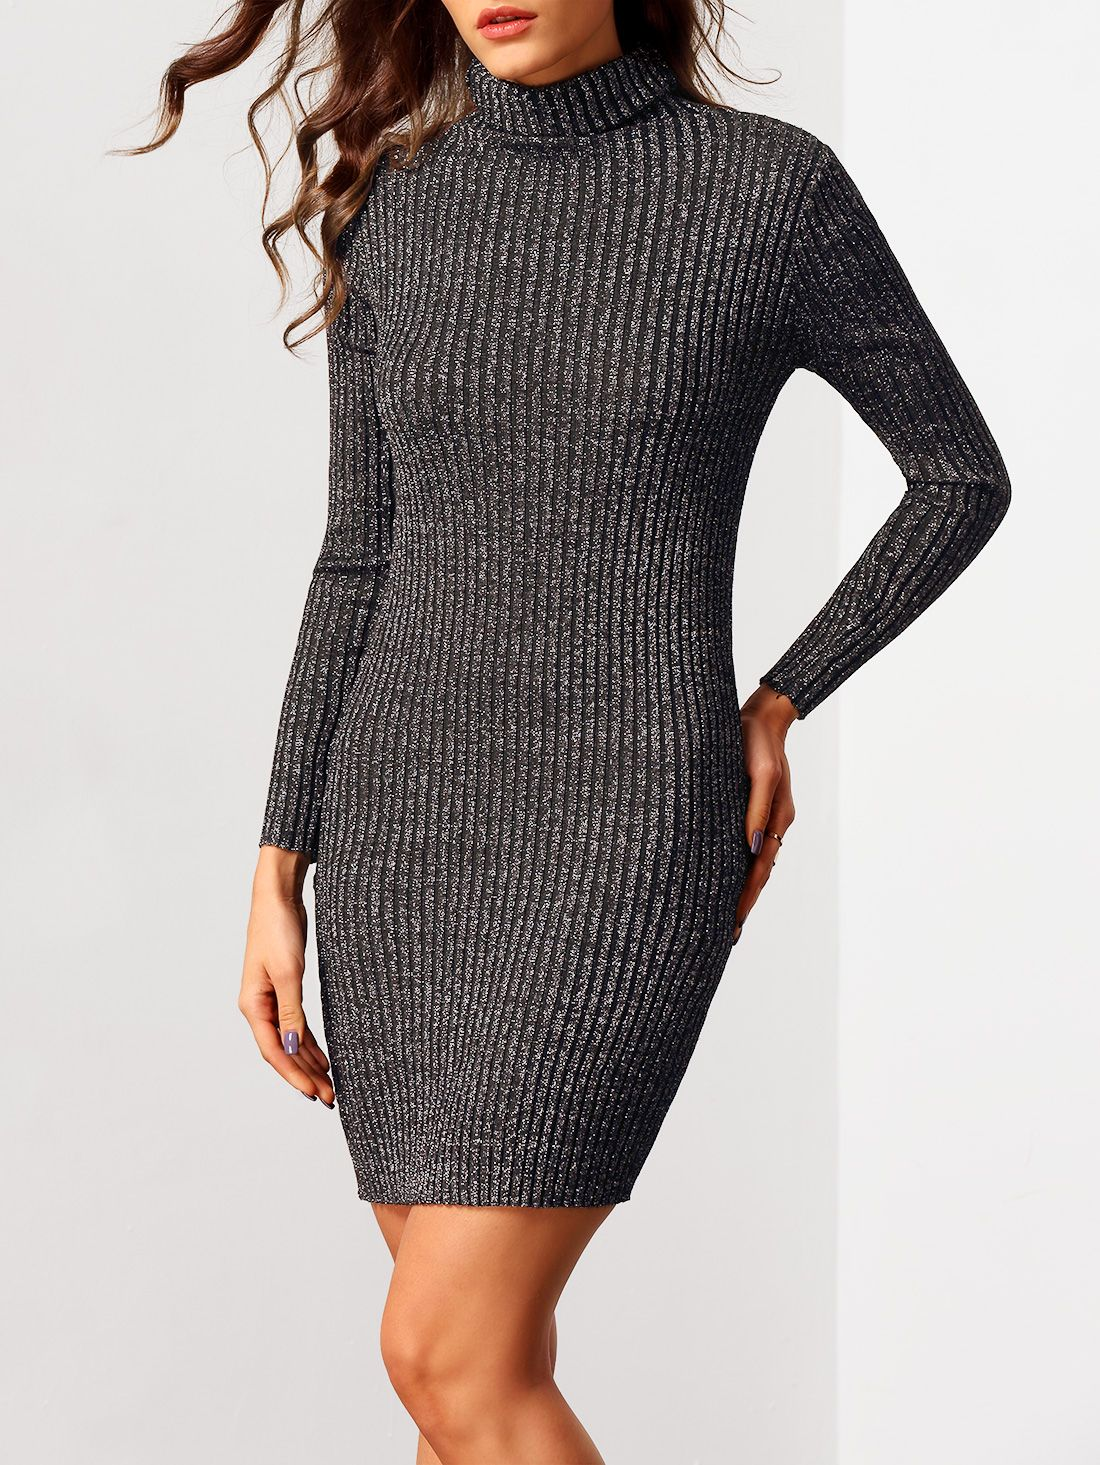 Shop black turtleneck long sleeve bodycon sweater dress online